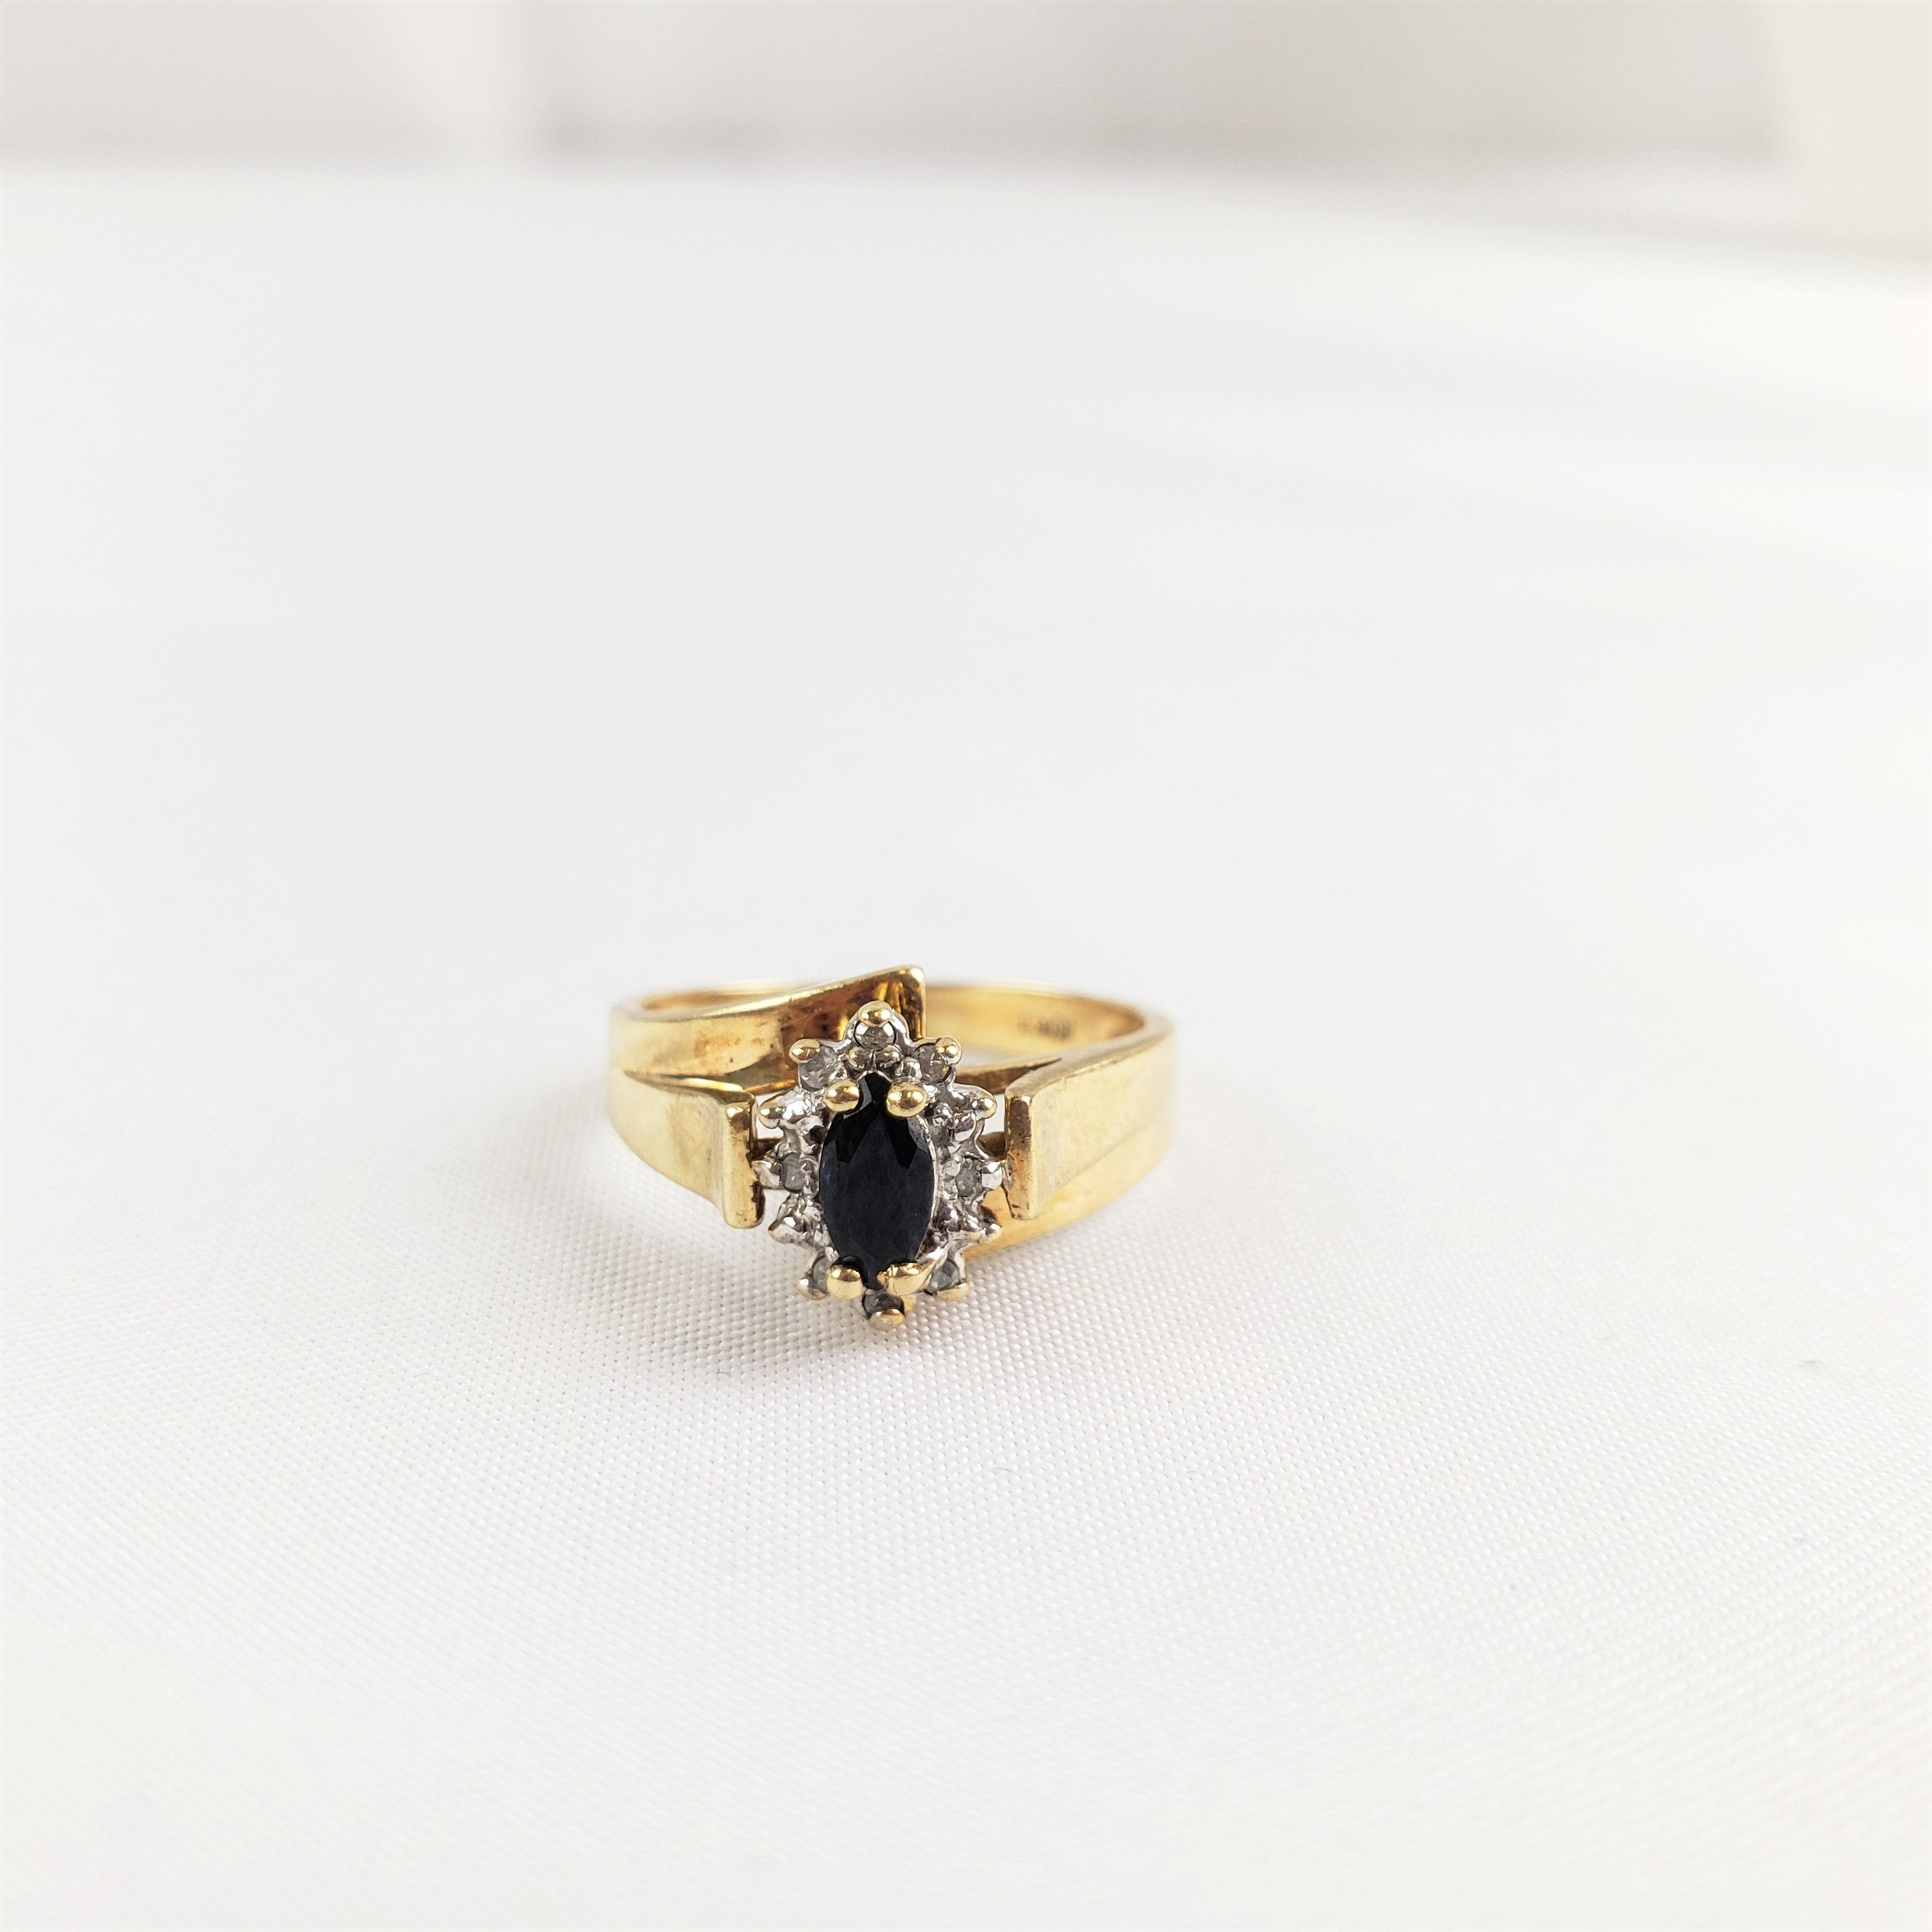 Diamond Sapphire 10kt Gold Ring 10kt Gold Ring Gold Rings 10kt Gold